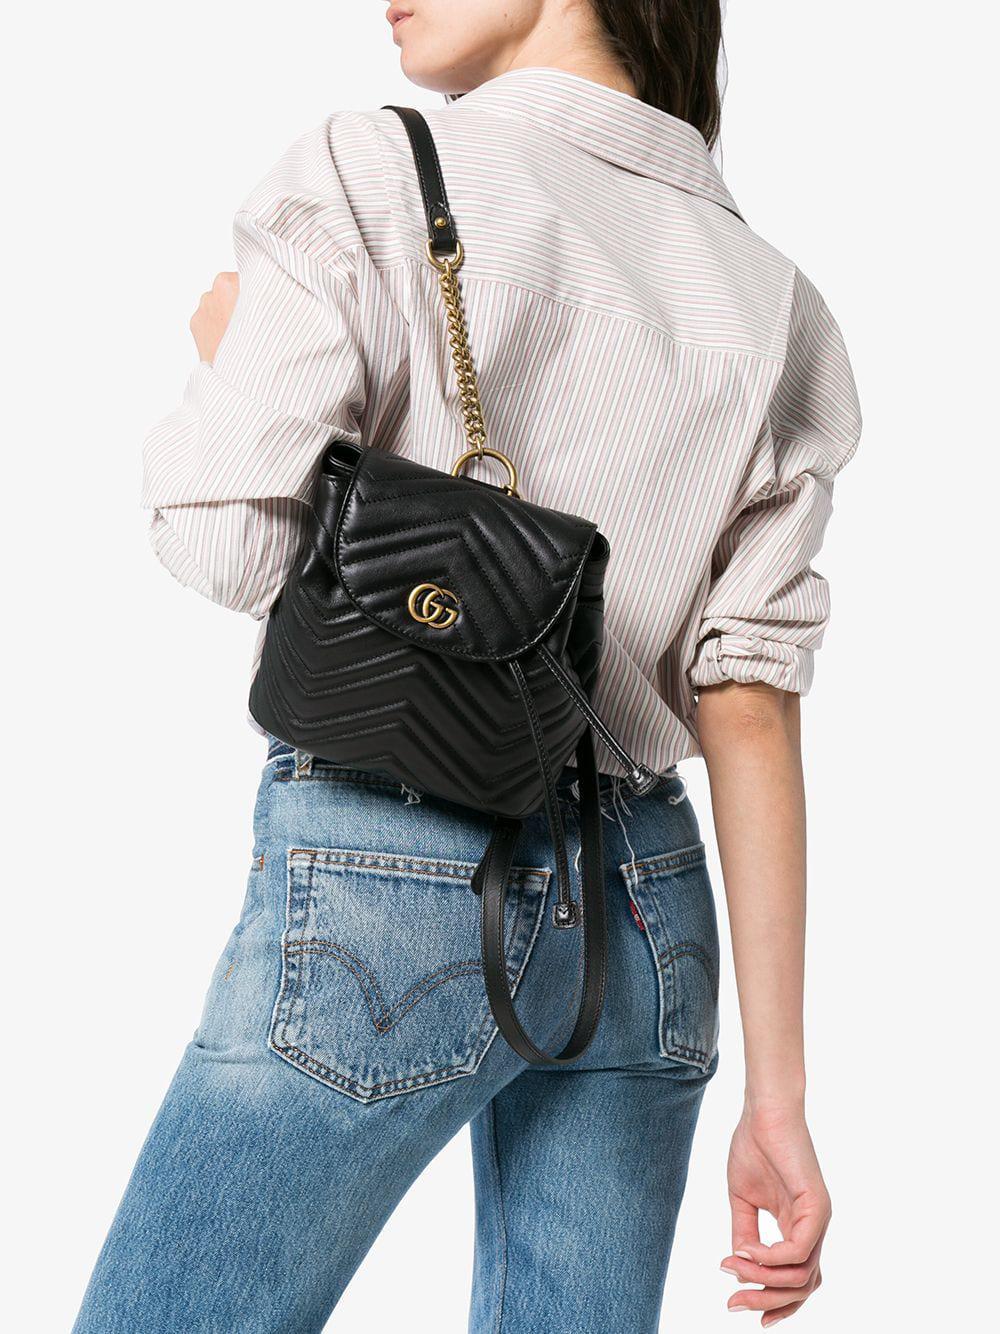 53f9e0ab8439 Gucci - Black GG Marmont Matelassé Backpack - Lyst. View fullscreen